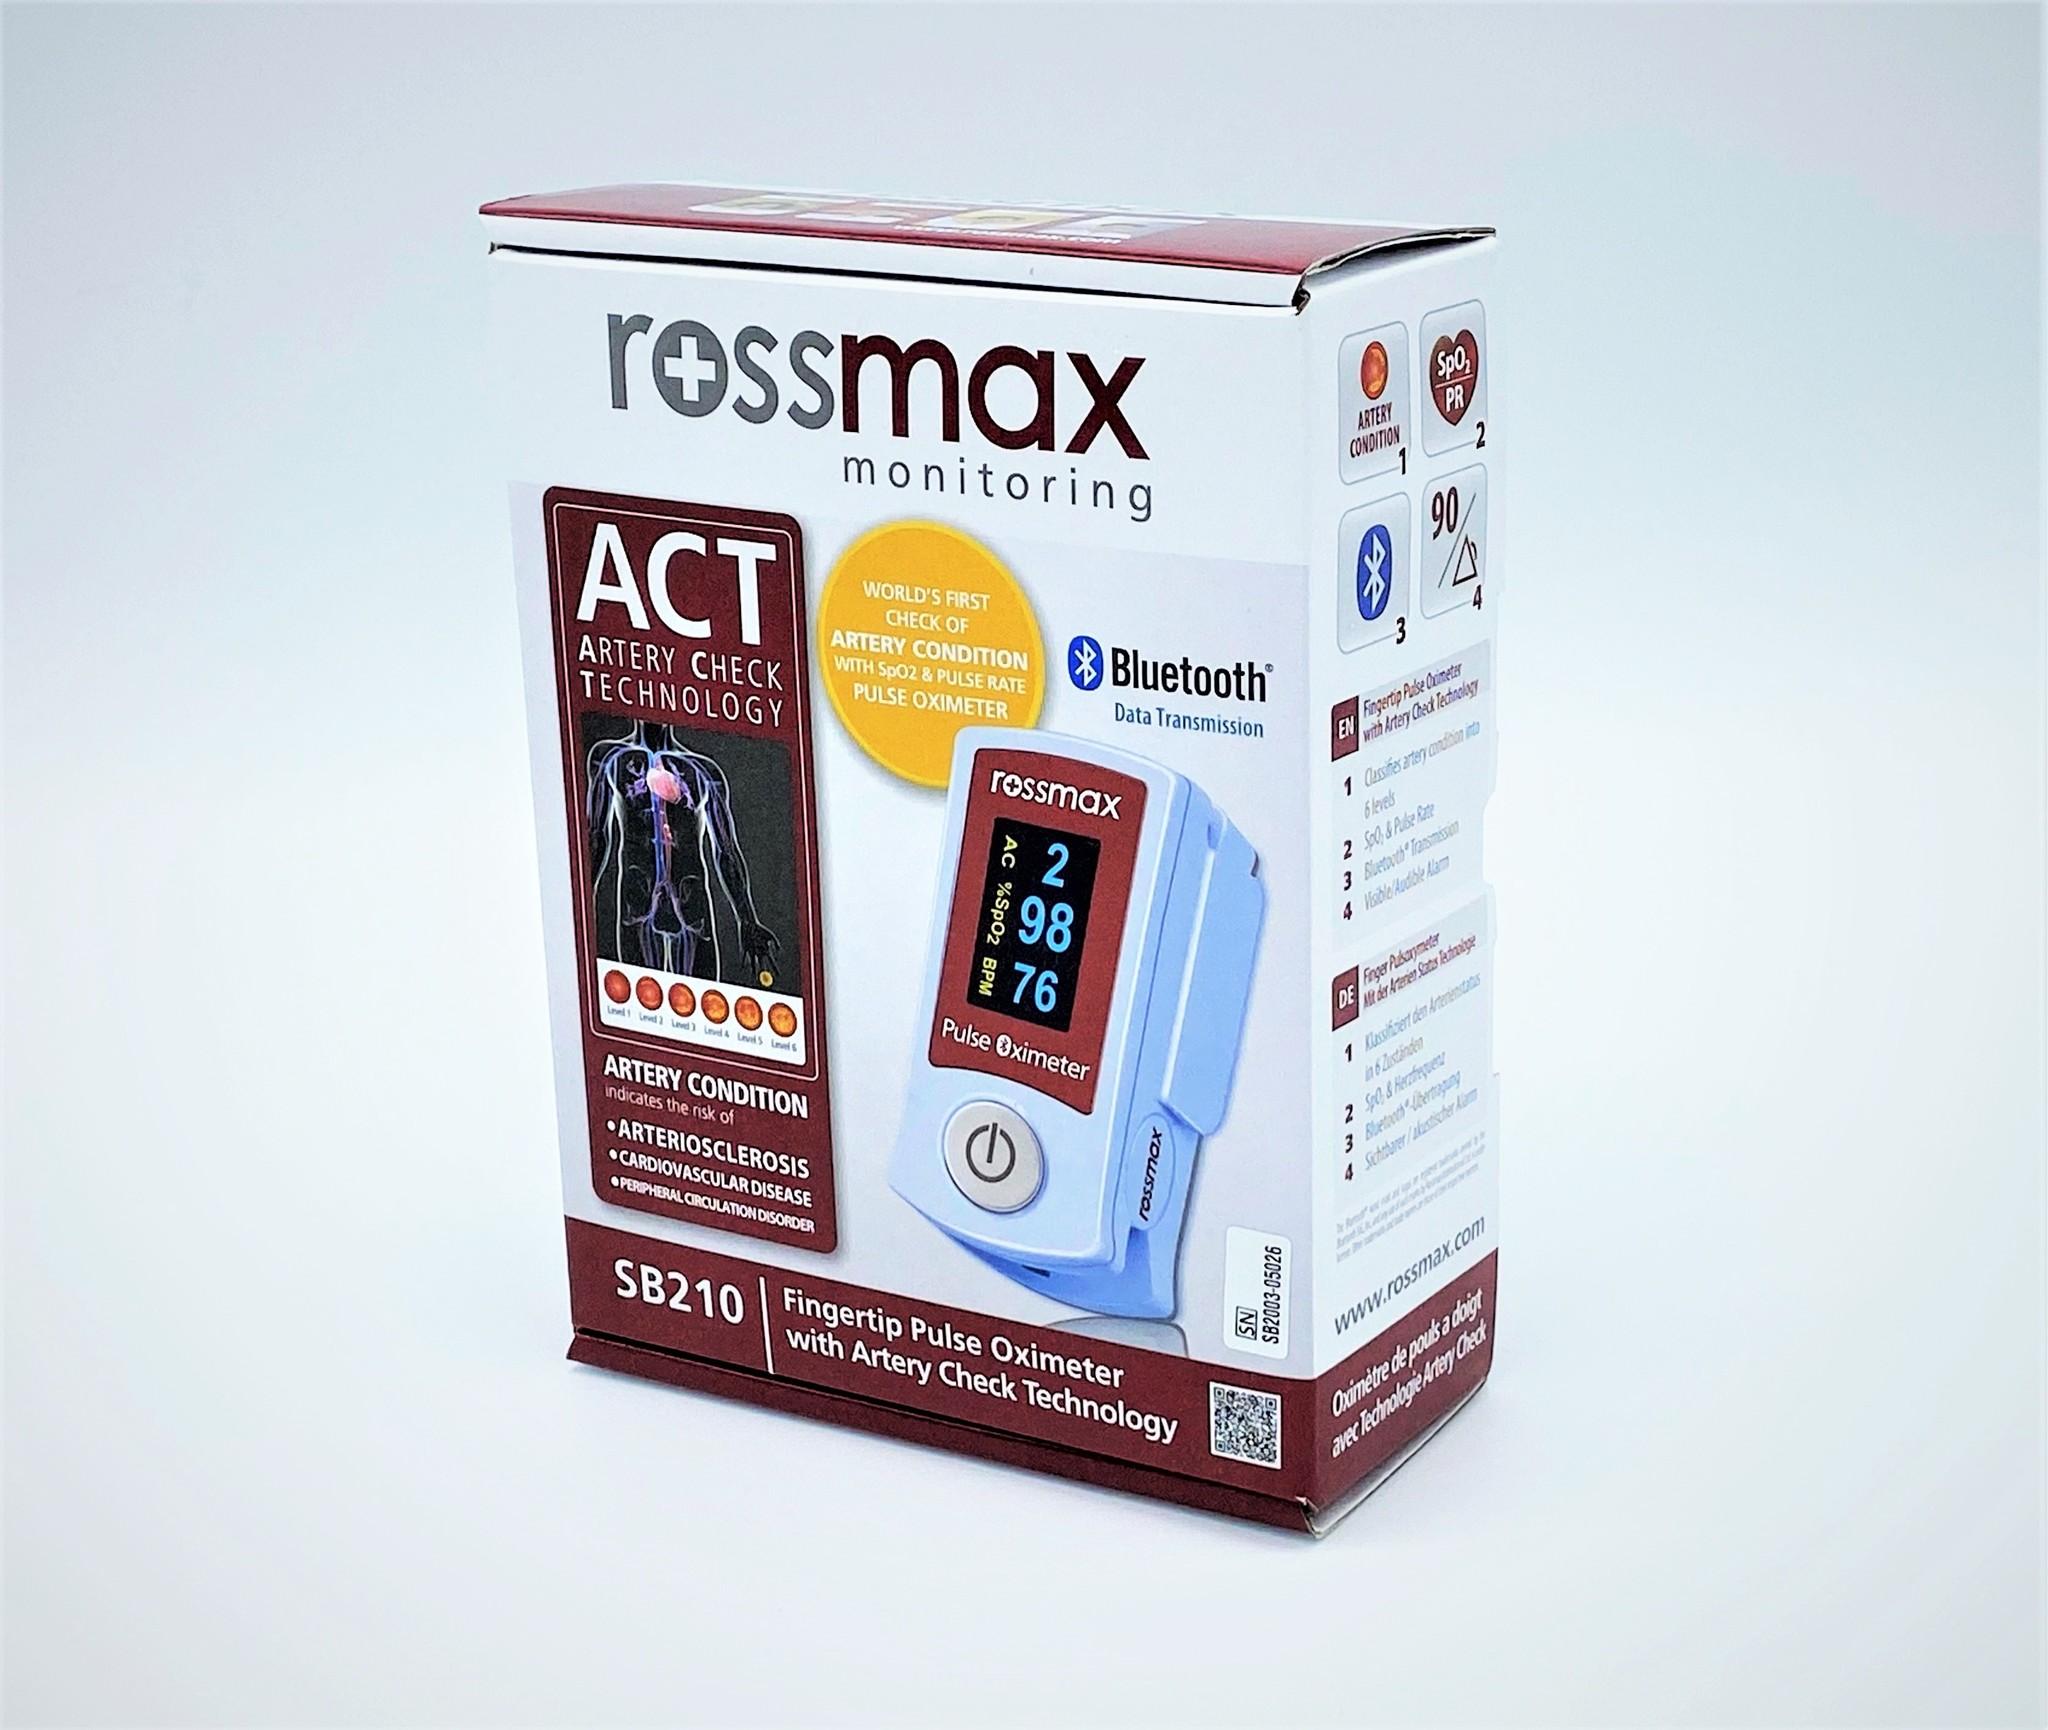 Rossmax APG pulse oximeter with arterial stiffness measurement (ACT)